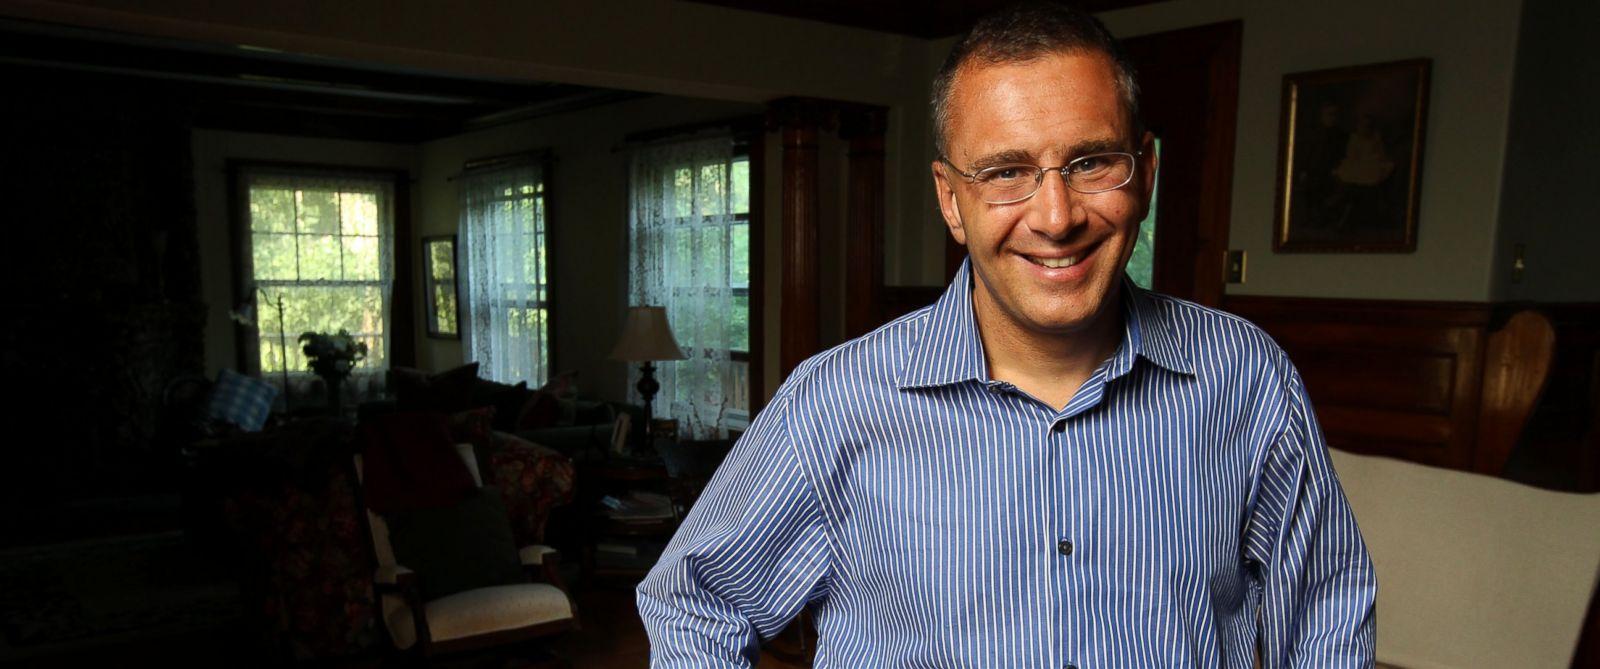 PHOTO: MIT professor of economics, Jonathan Gruber, at his home, June 29, 2012.